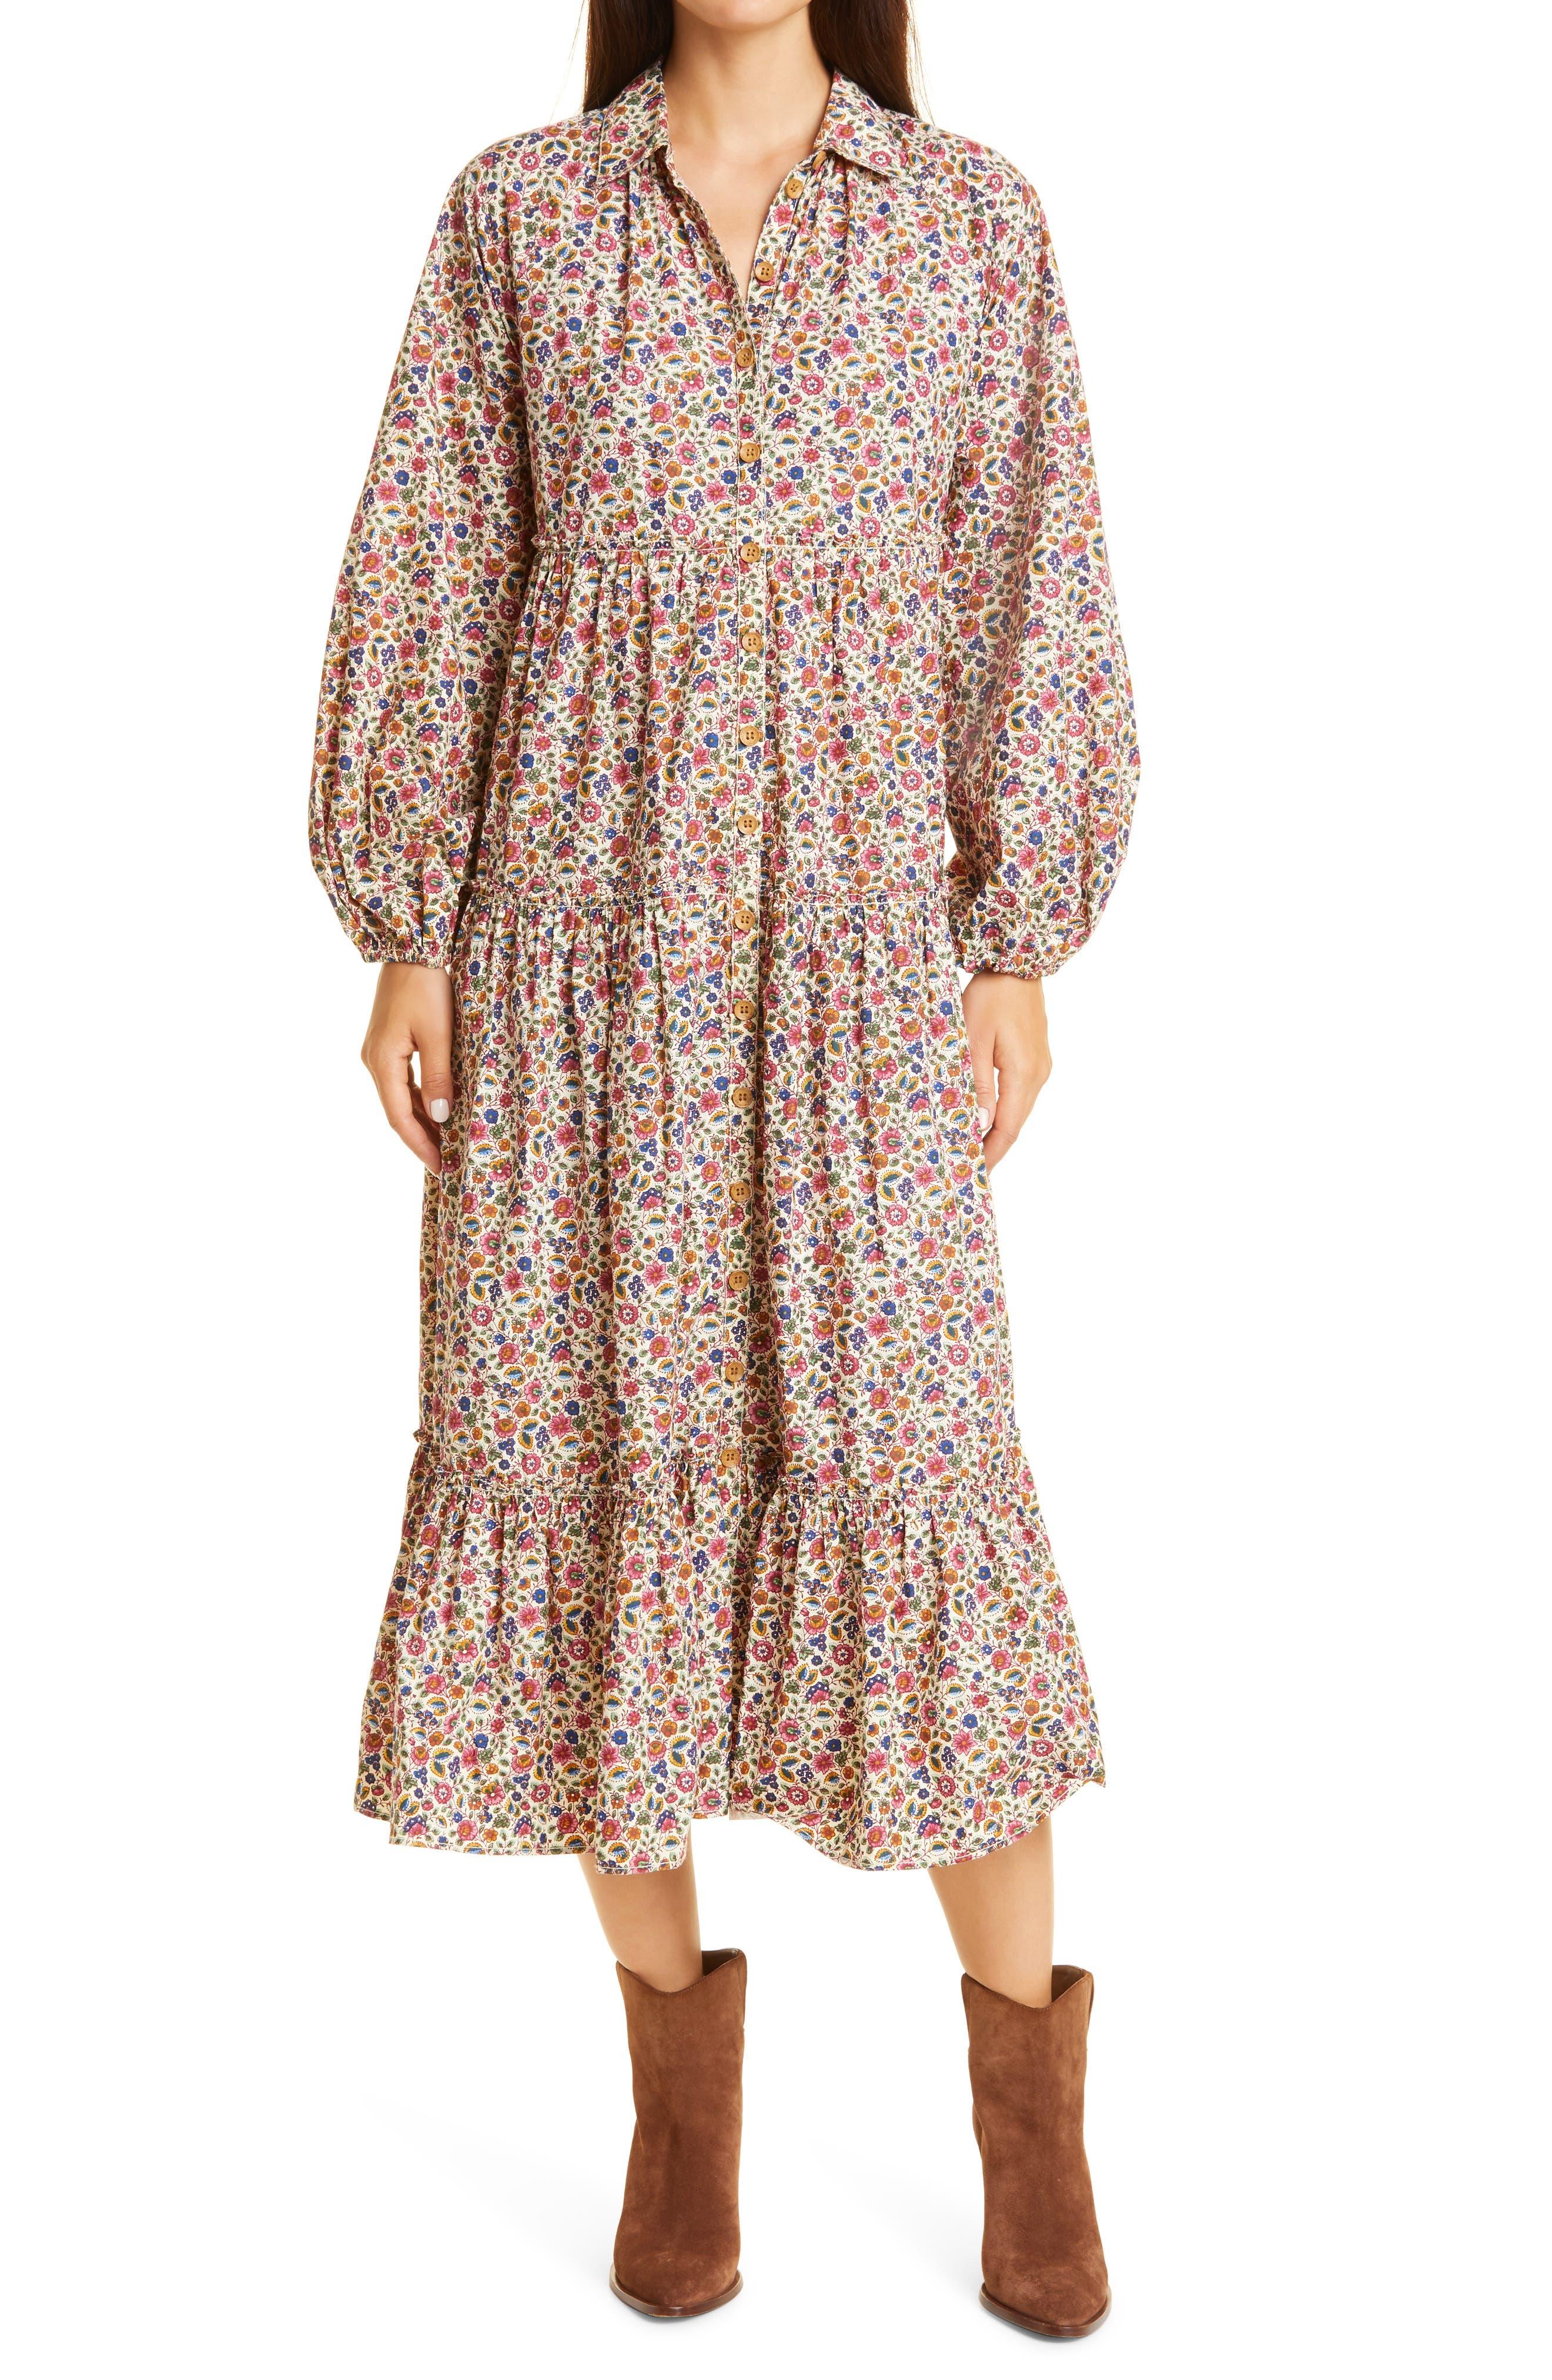 '50S Cotton Long Sleeve Shirtdress